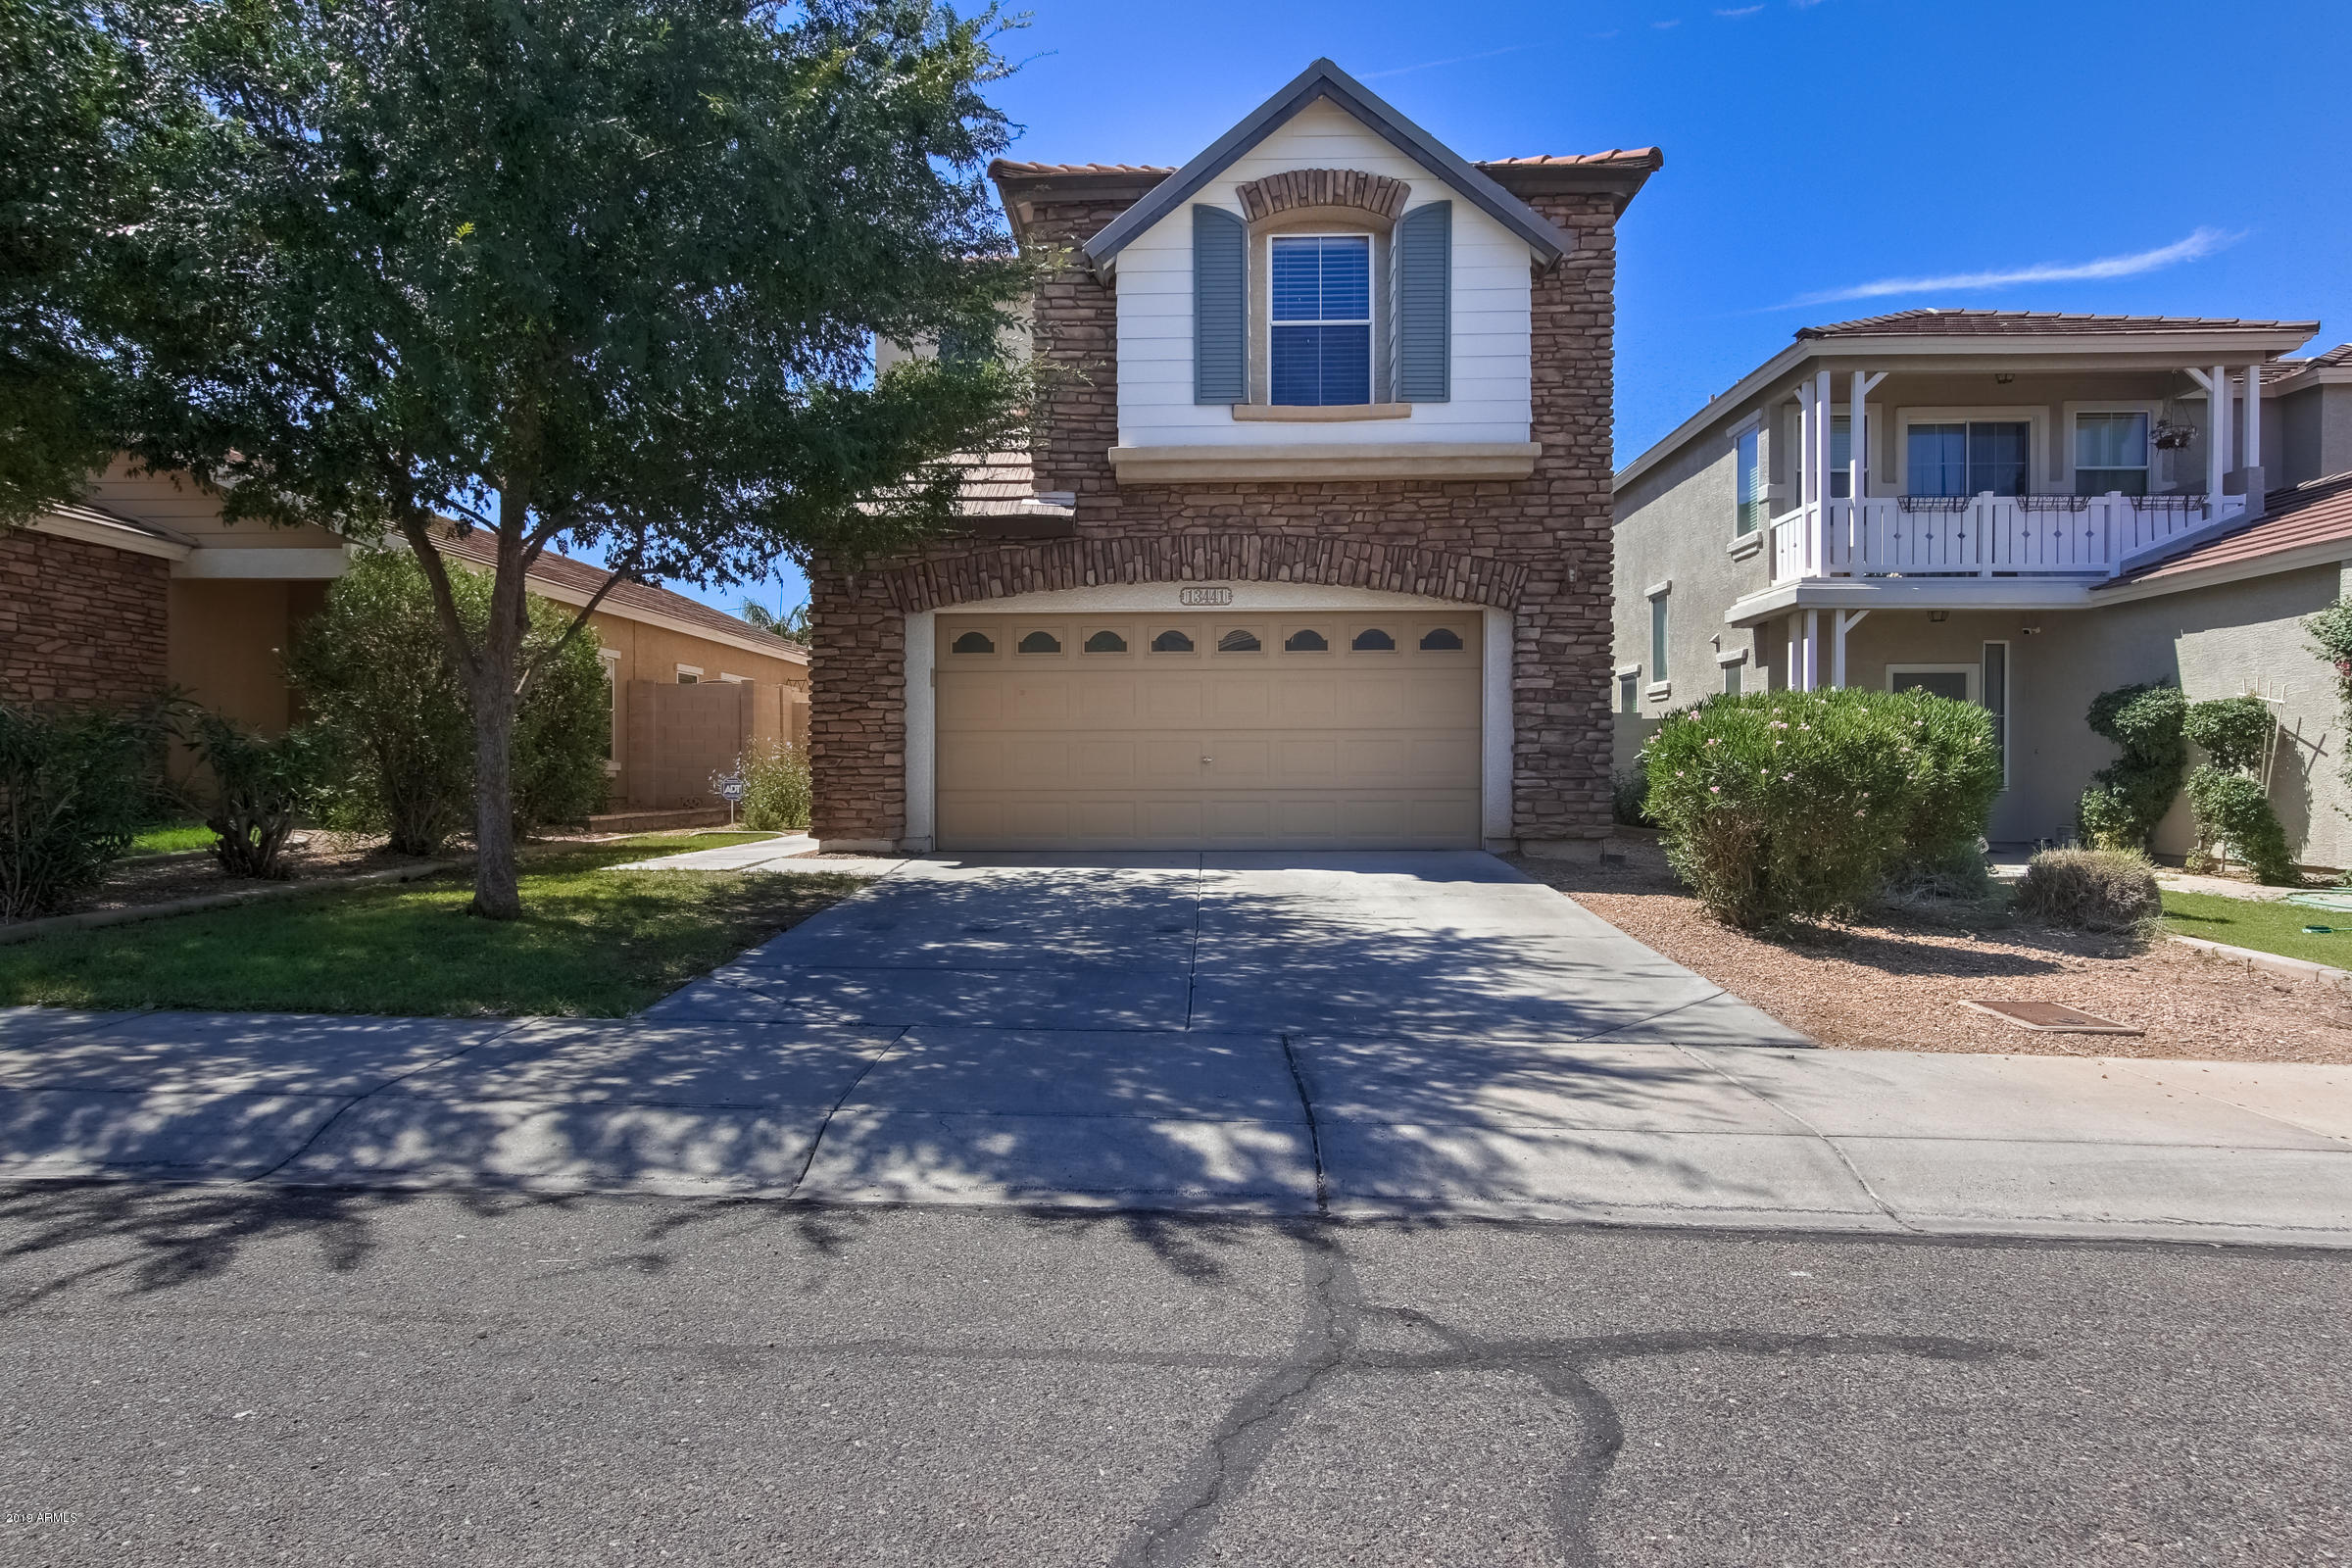 Photo of 13441 W KEIM Drive, Litchfield Park, AZ 85340